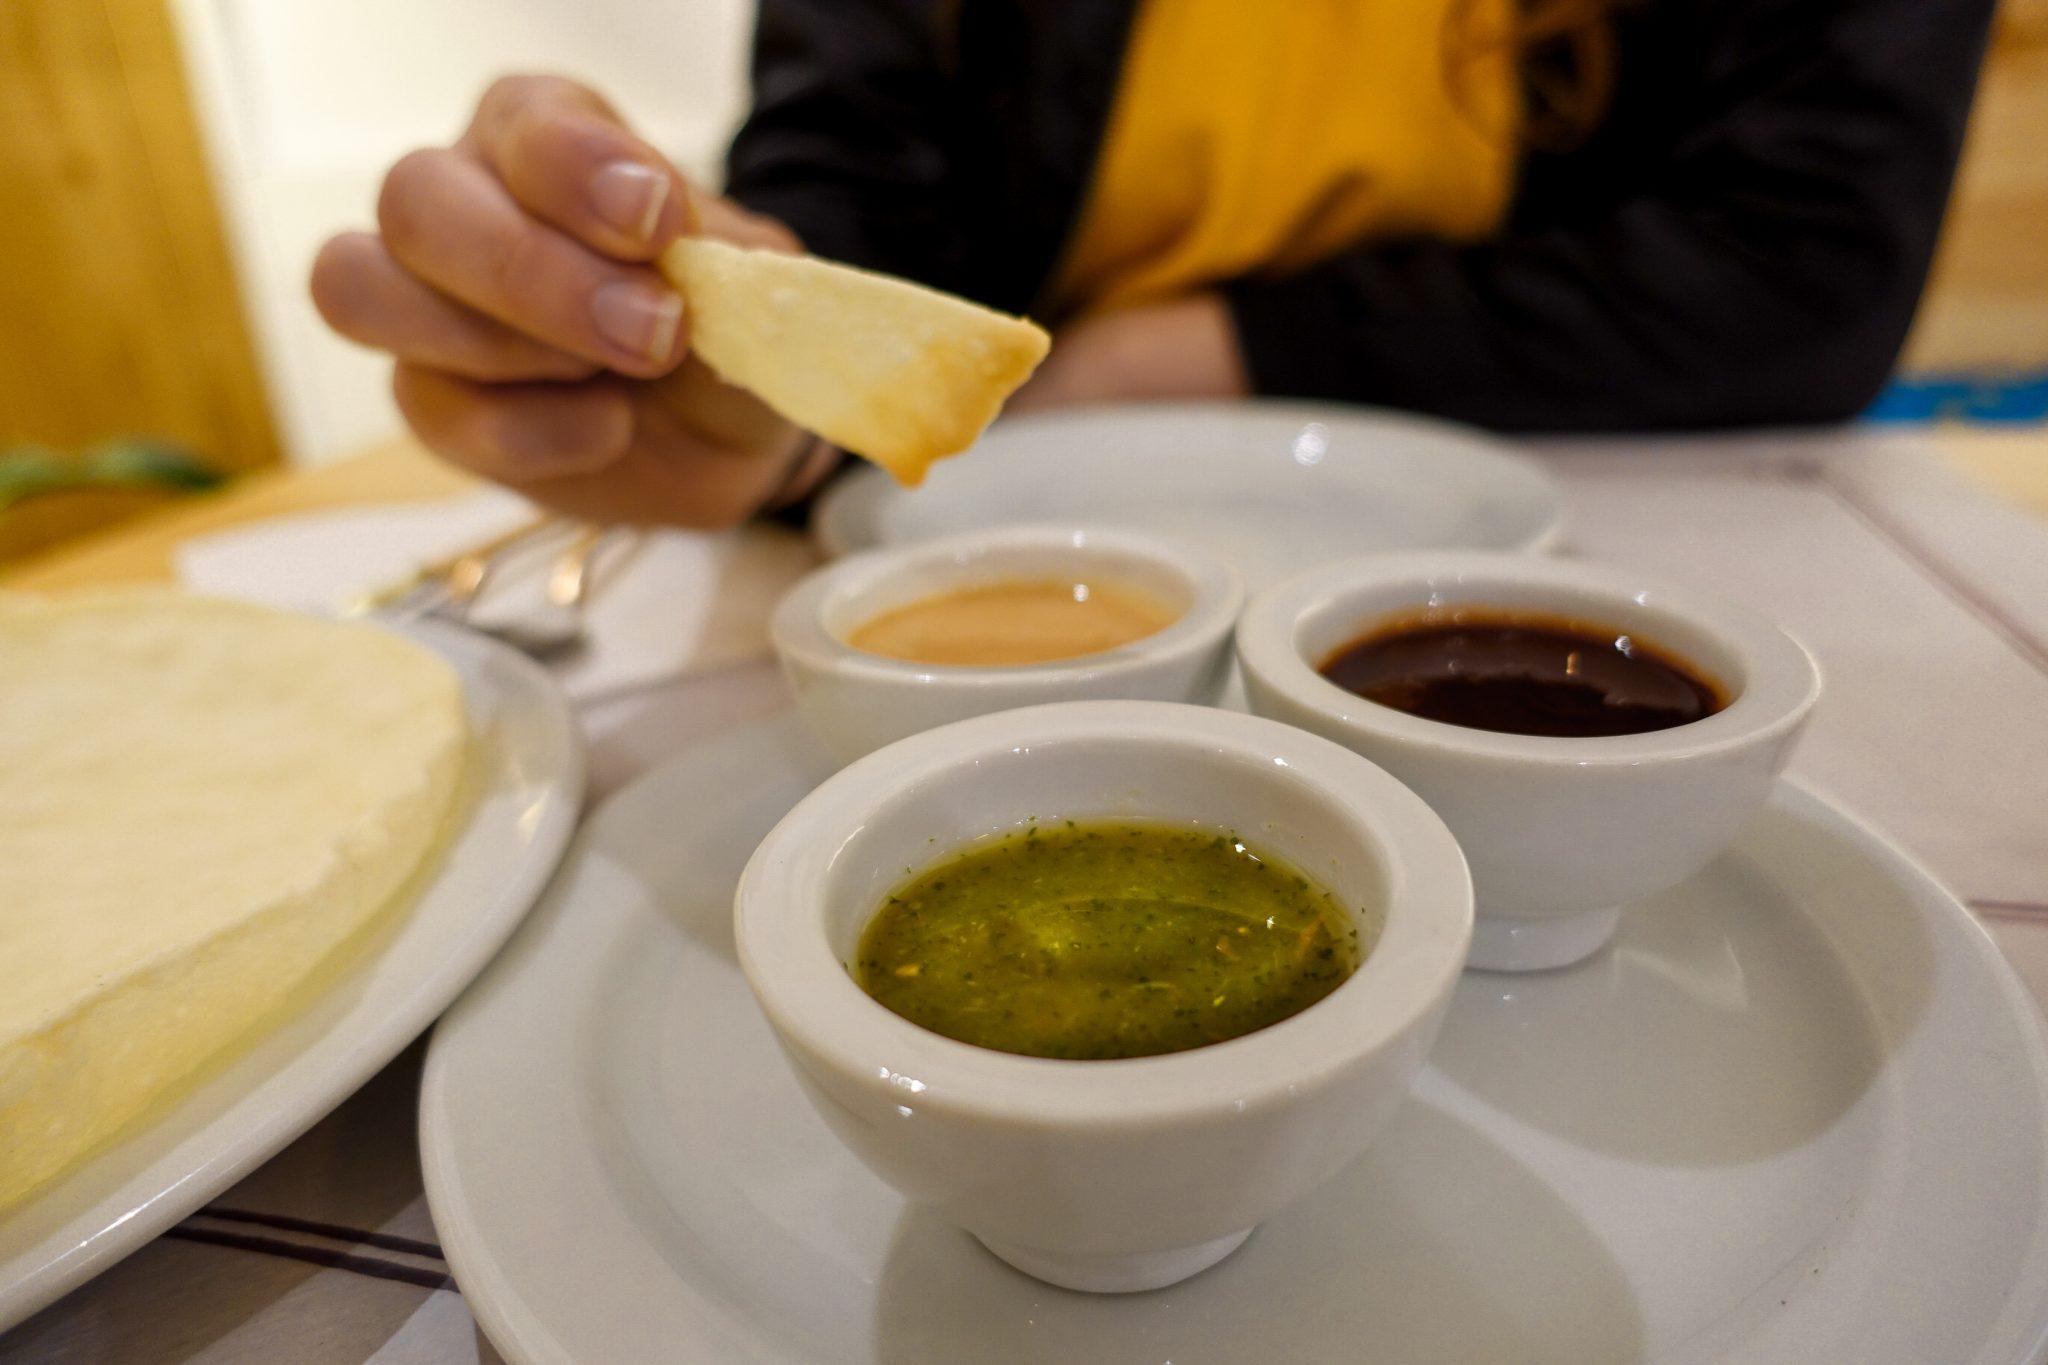 calella-travel-guide-winter-kurkuma-restaurant-küche